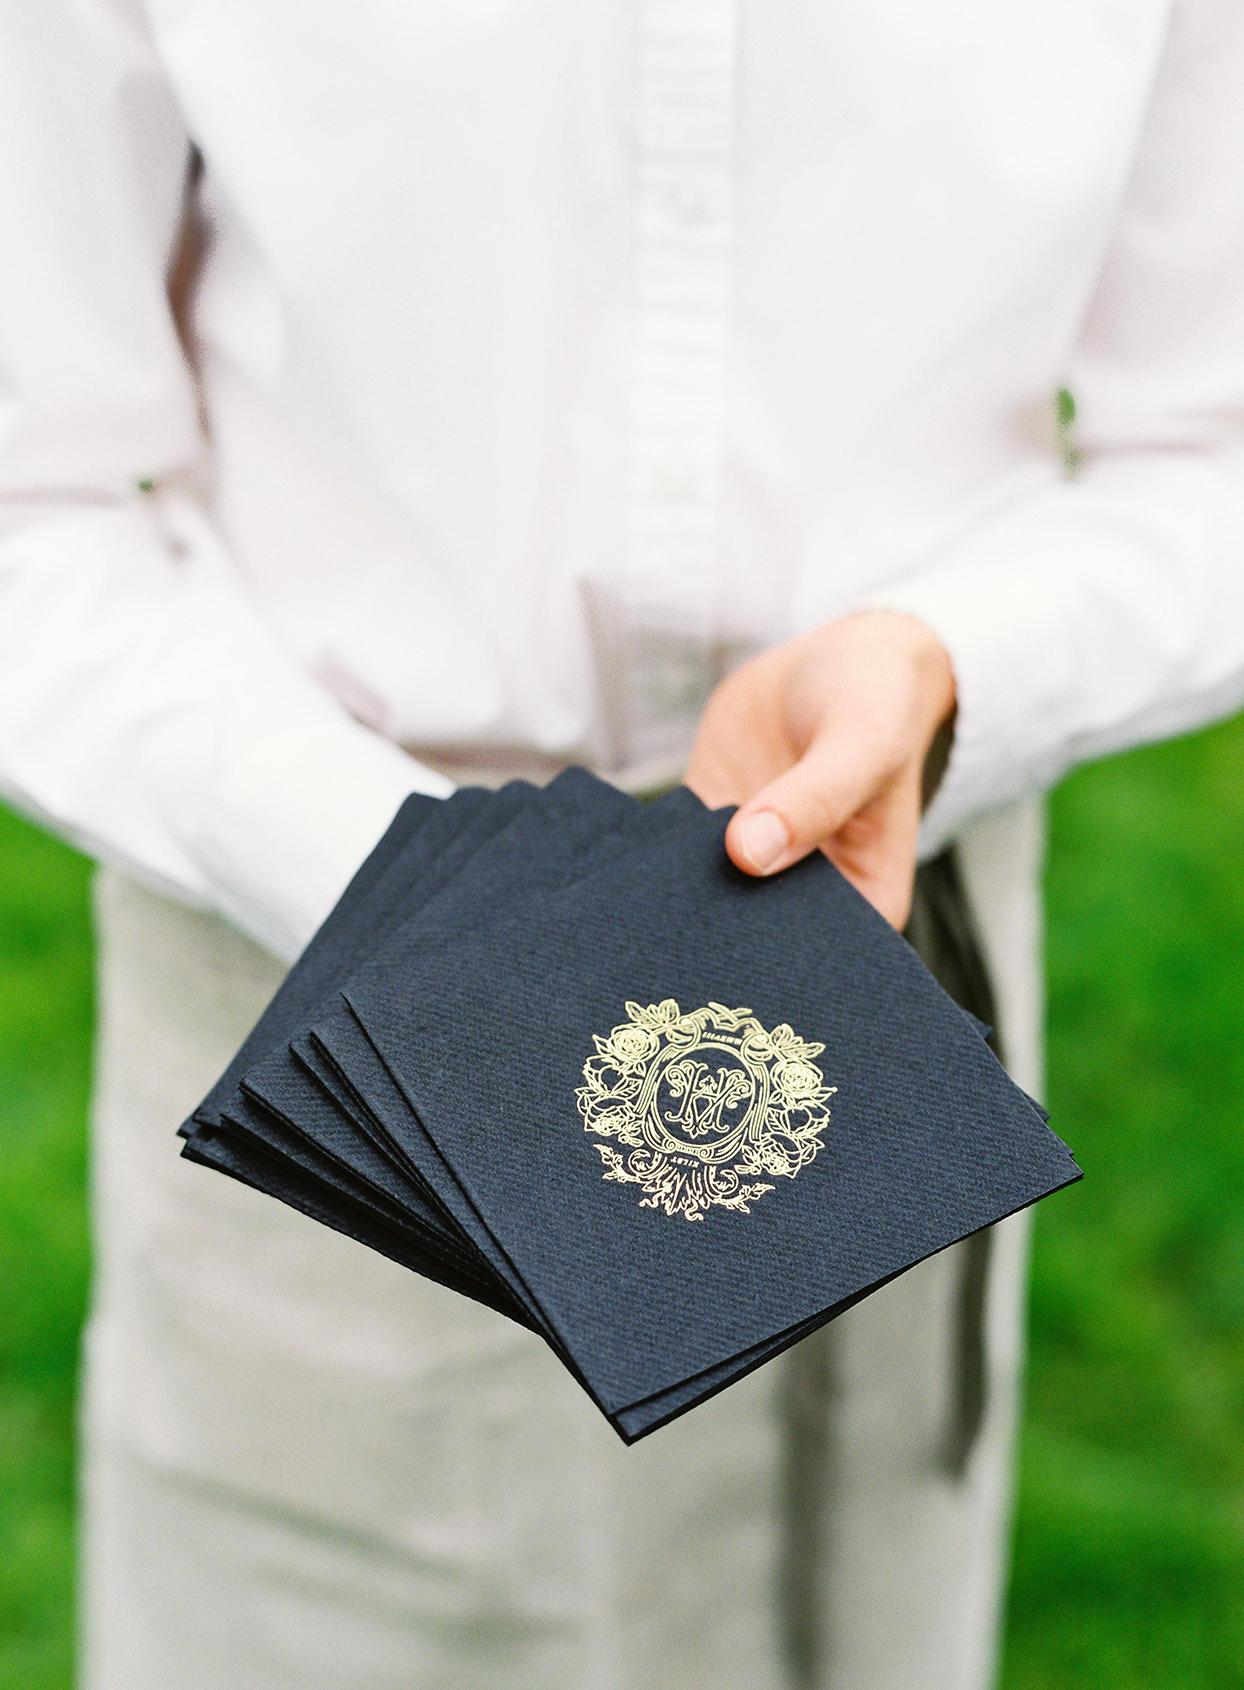 hillary alexander wedding napkins with crest